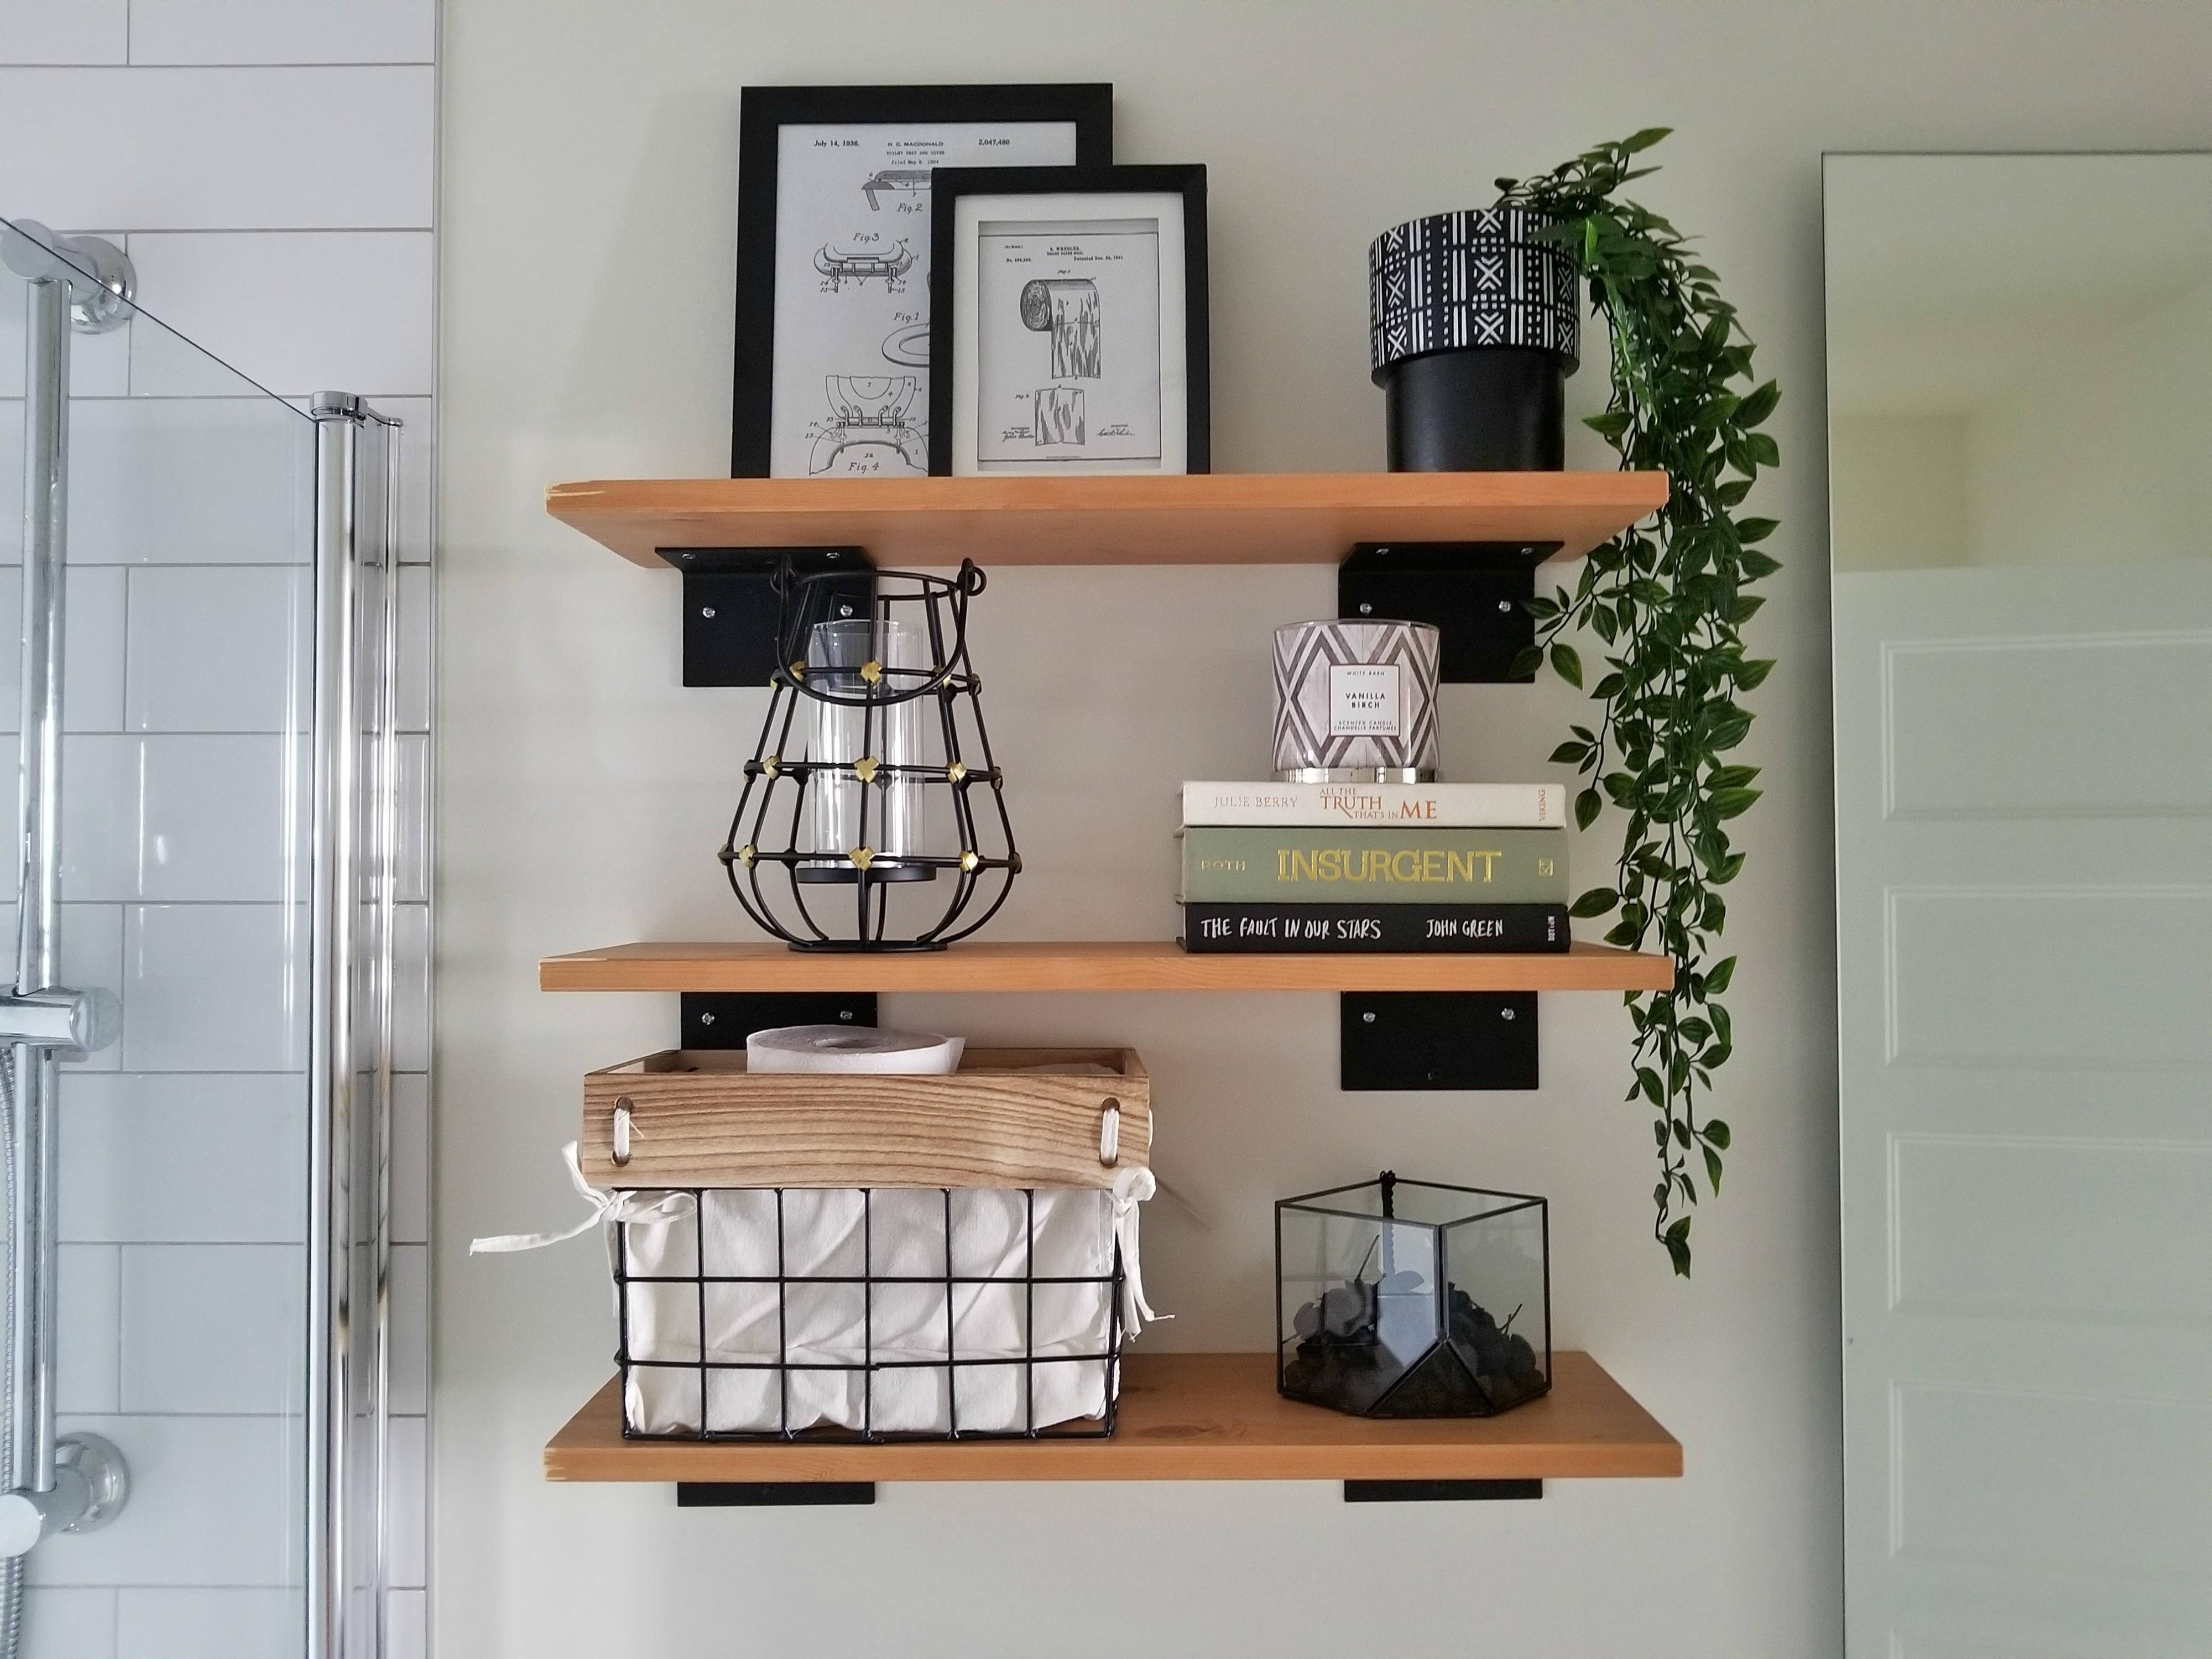 How to hang ikea wall shelves